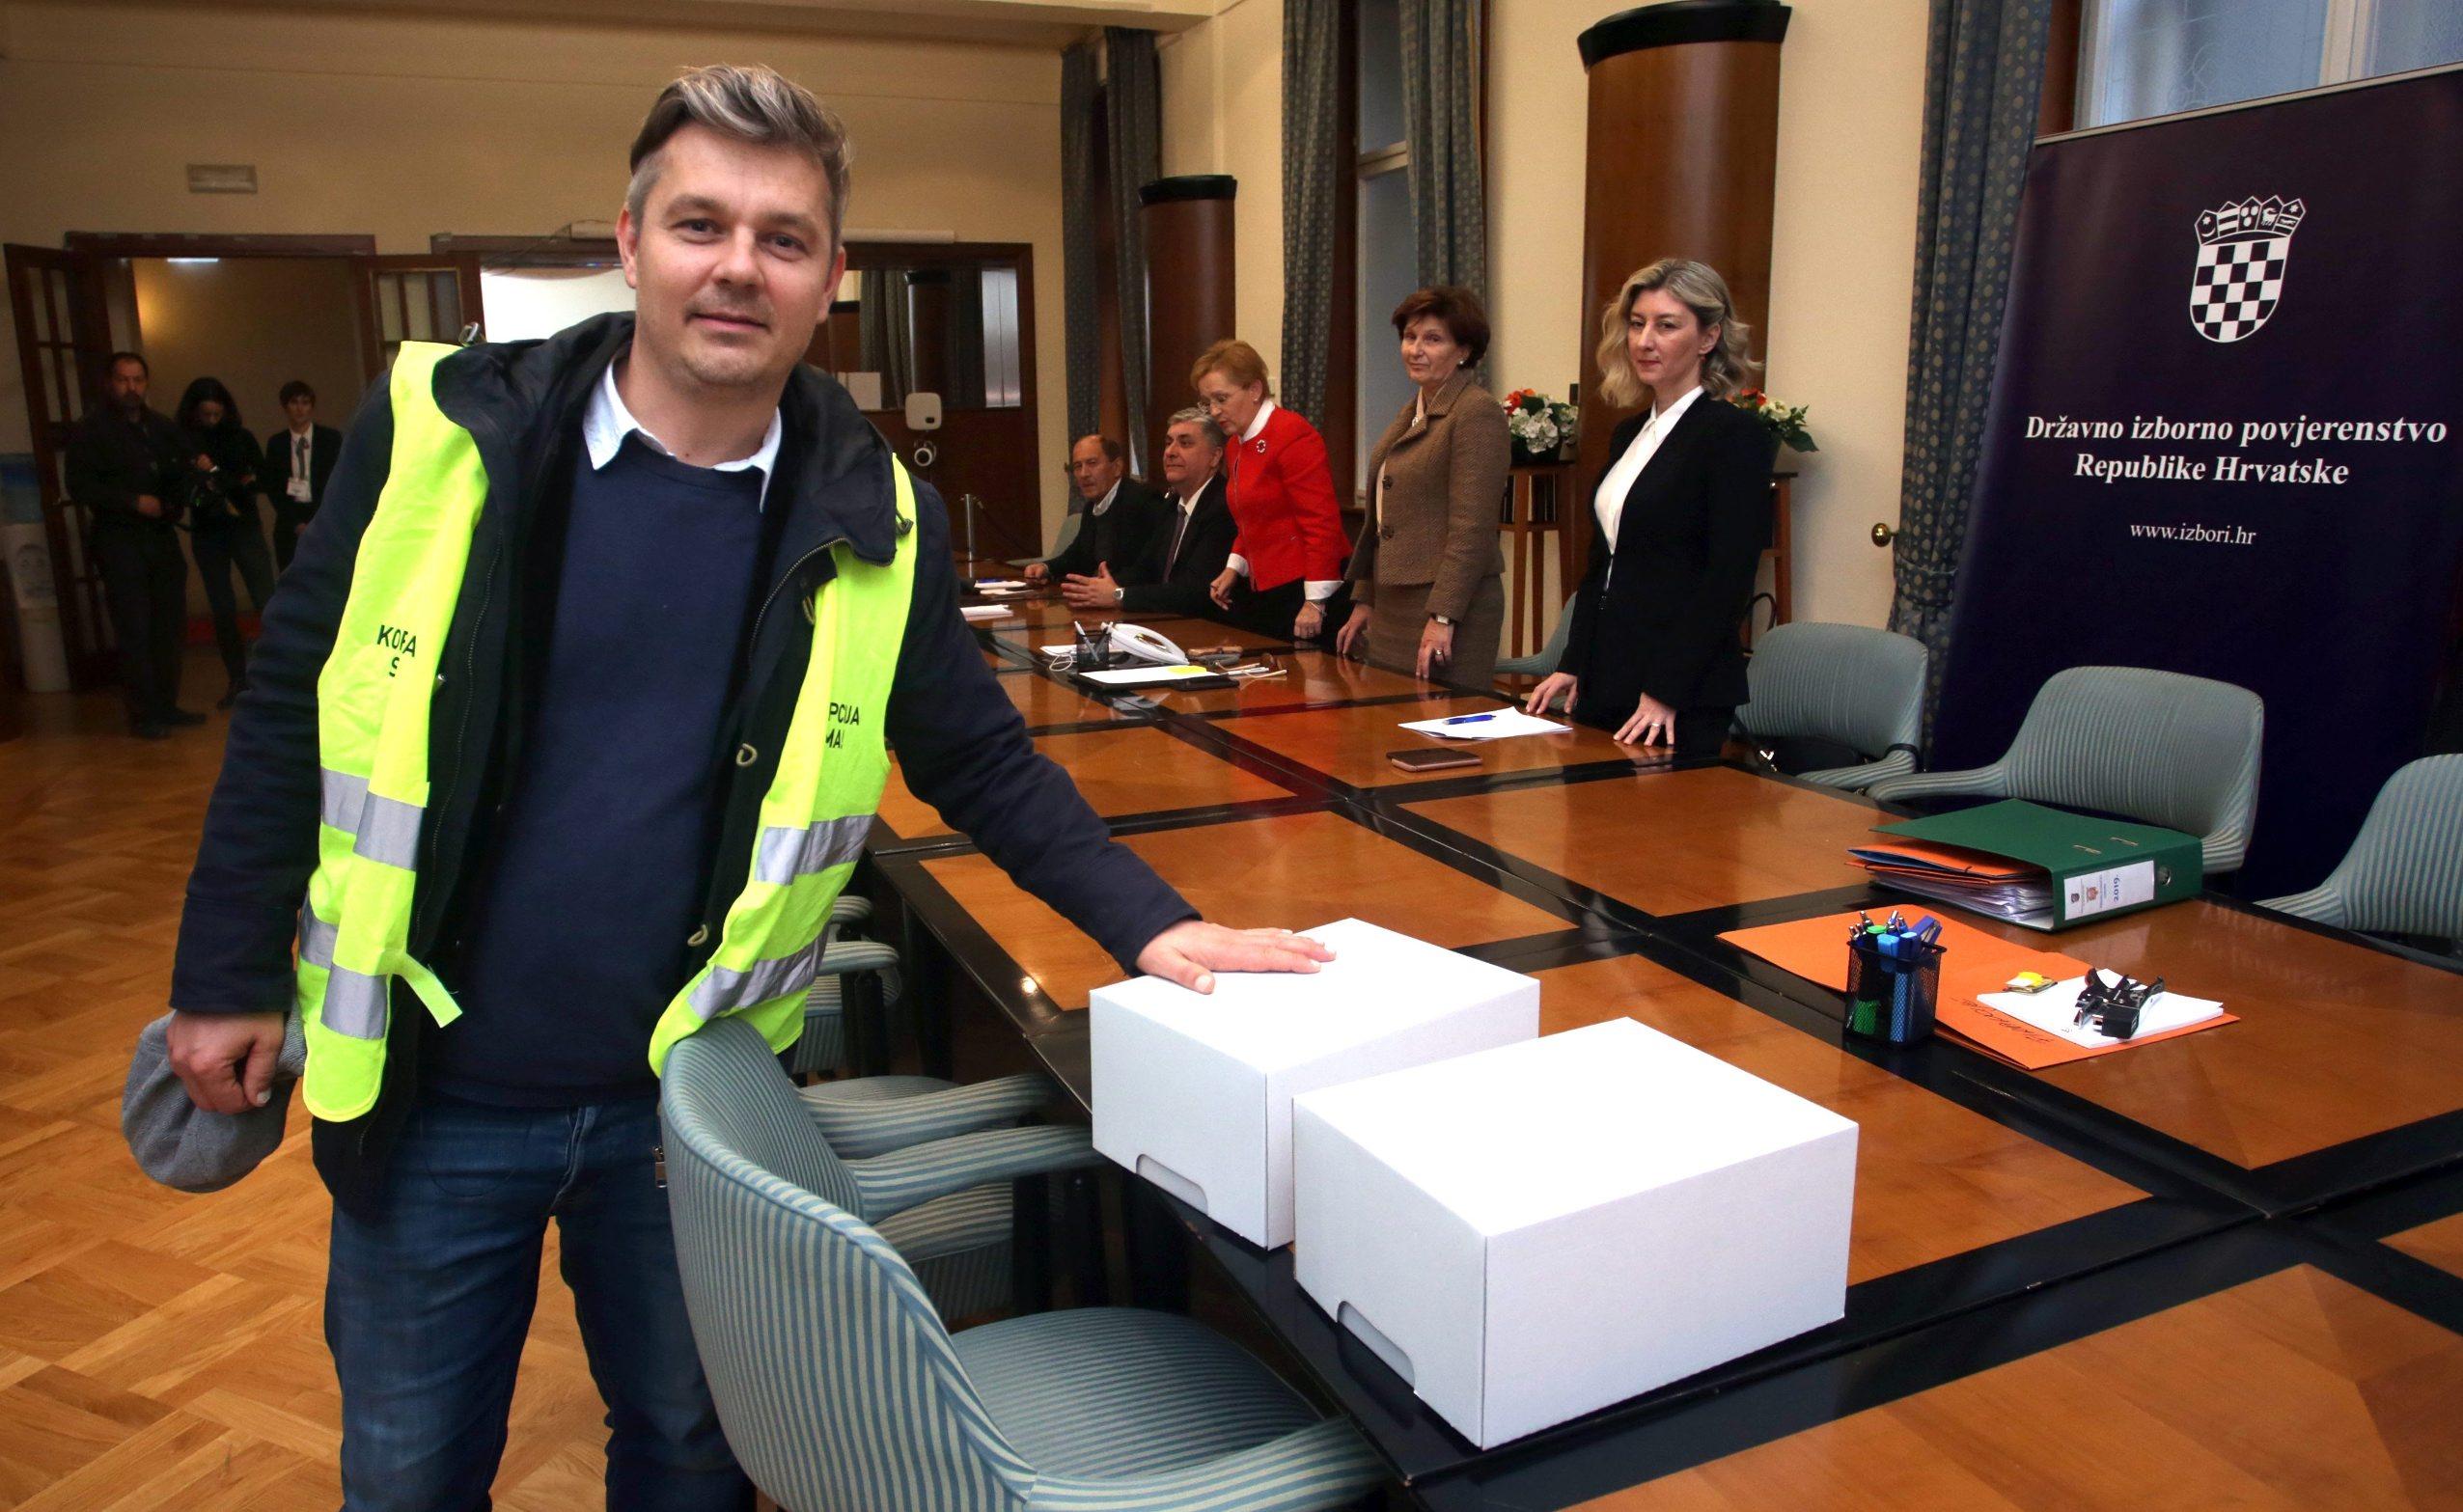 Zagreb, 031219. Sabor RH. Dario Jurican predao potpise za kandidaturu za predsjednika Republike Hrvatske. Foto: Damjan Tadic / CROPIX